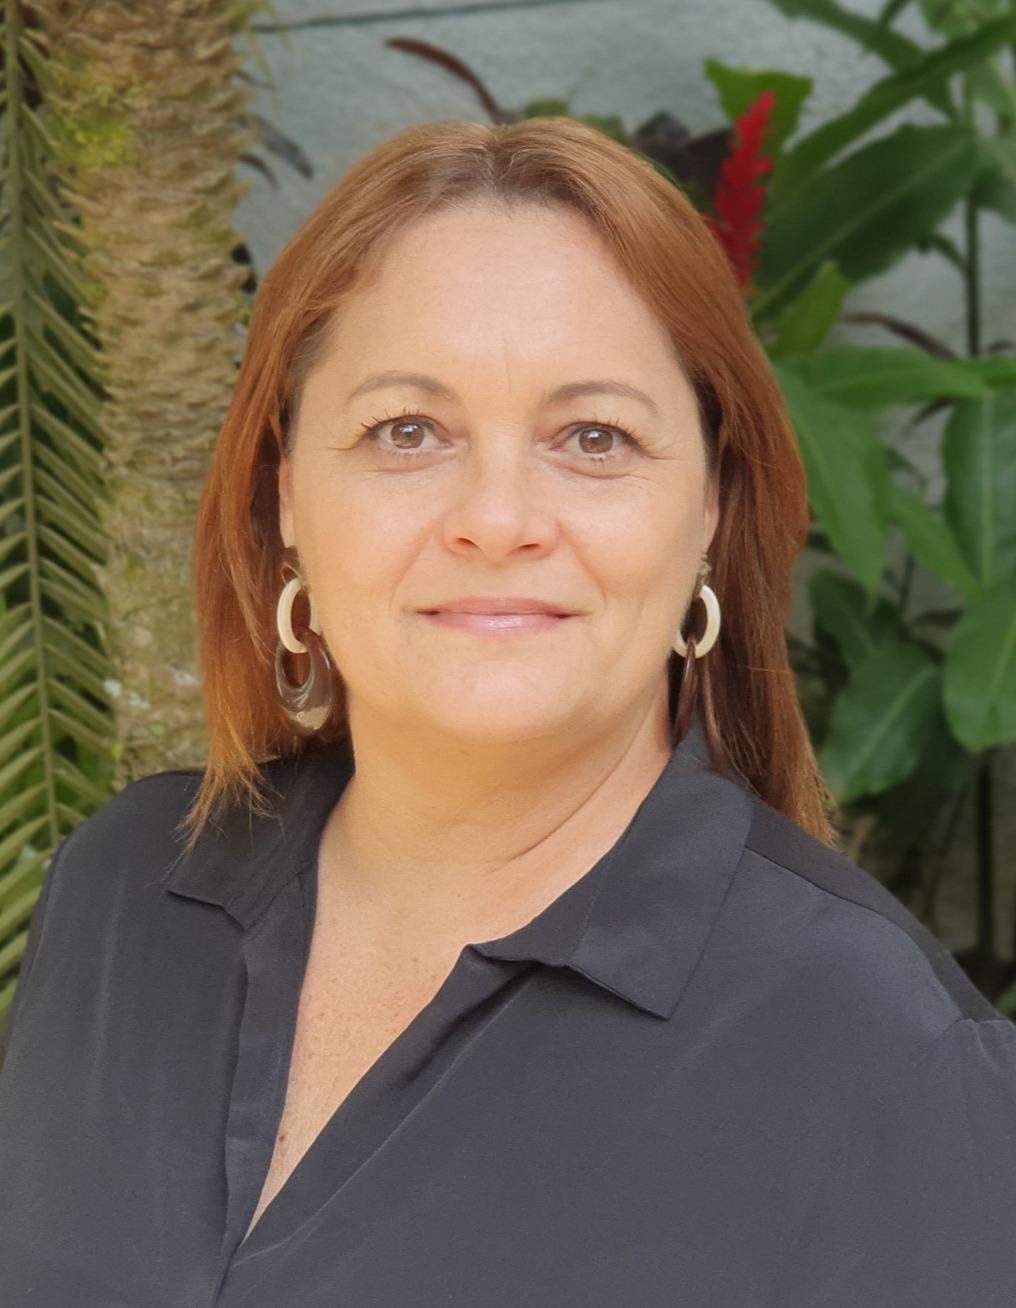 Roberta Maluf